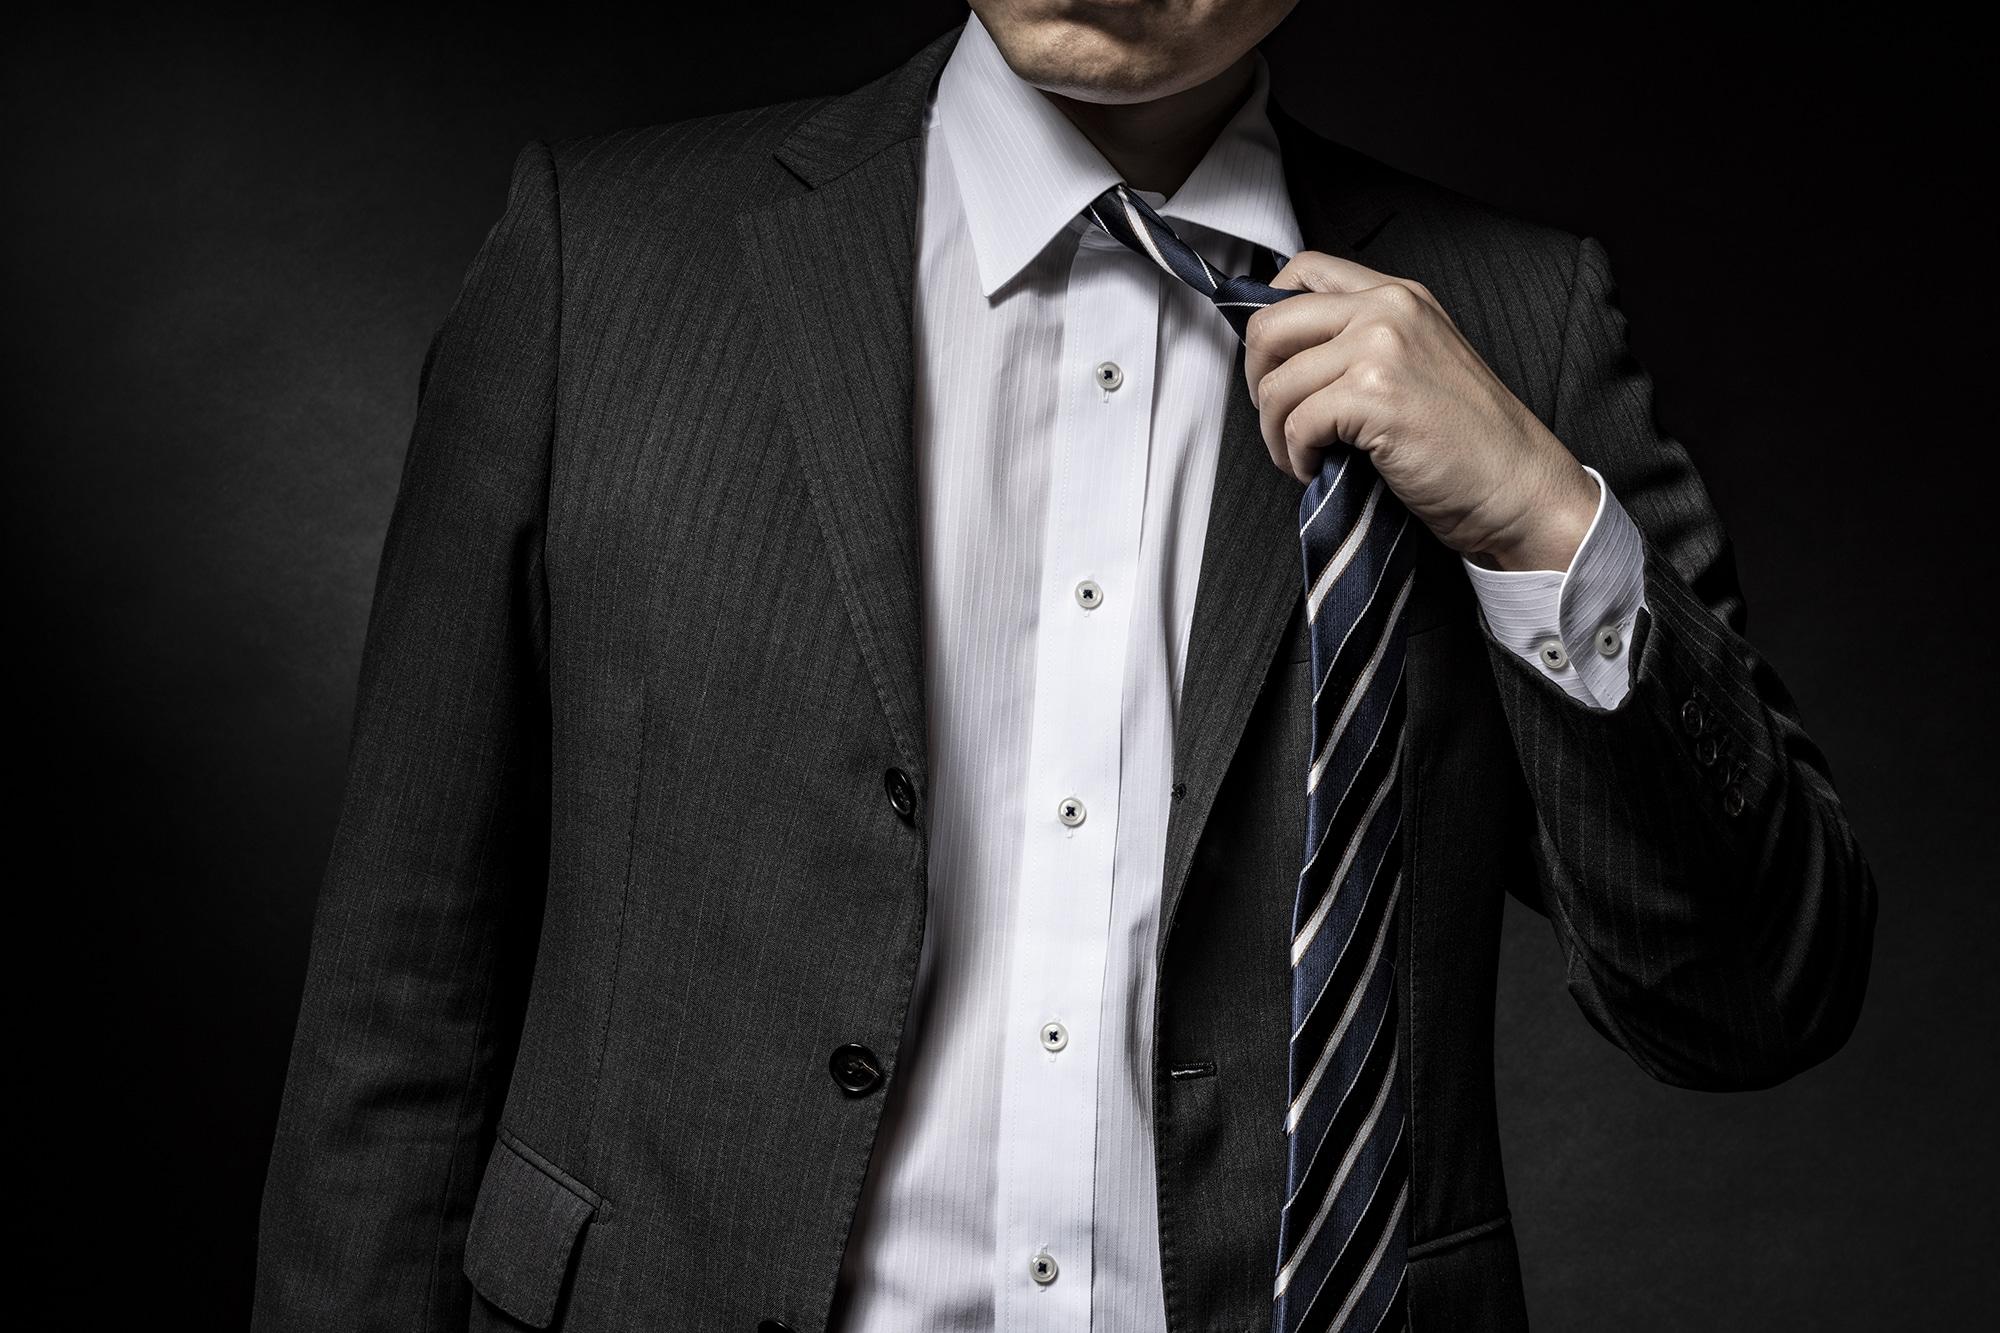 2020 08 31 Niedergang der Krawatte